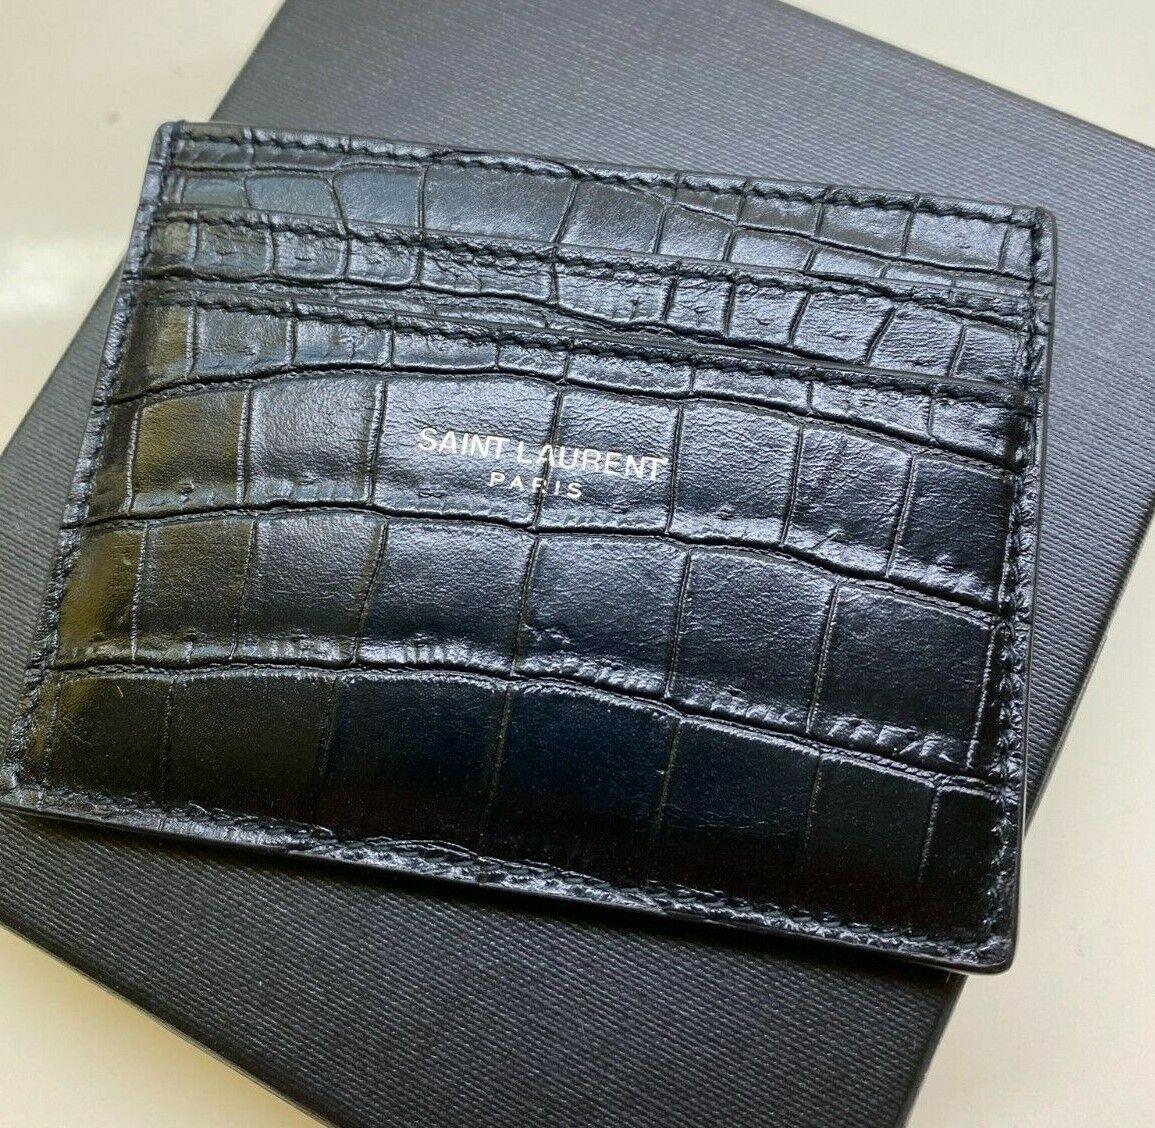 Appraised Saint Laurent YSL Leather Card Case crocodile textured Card holder